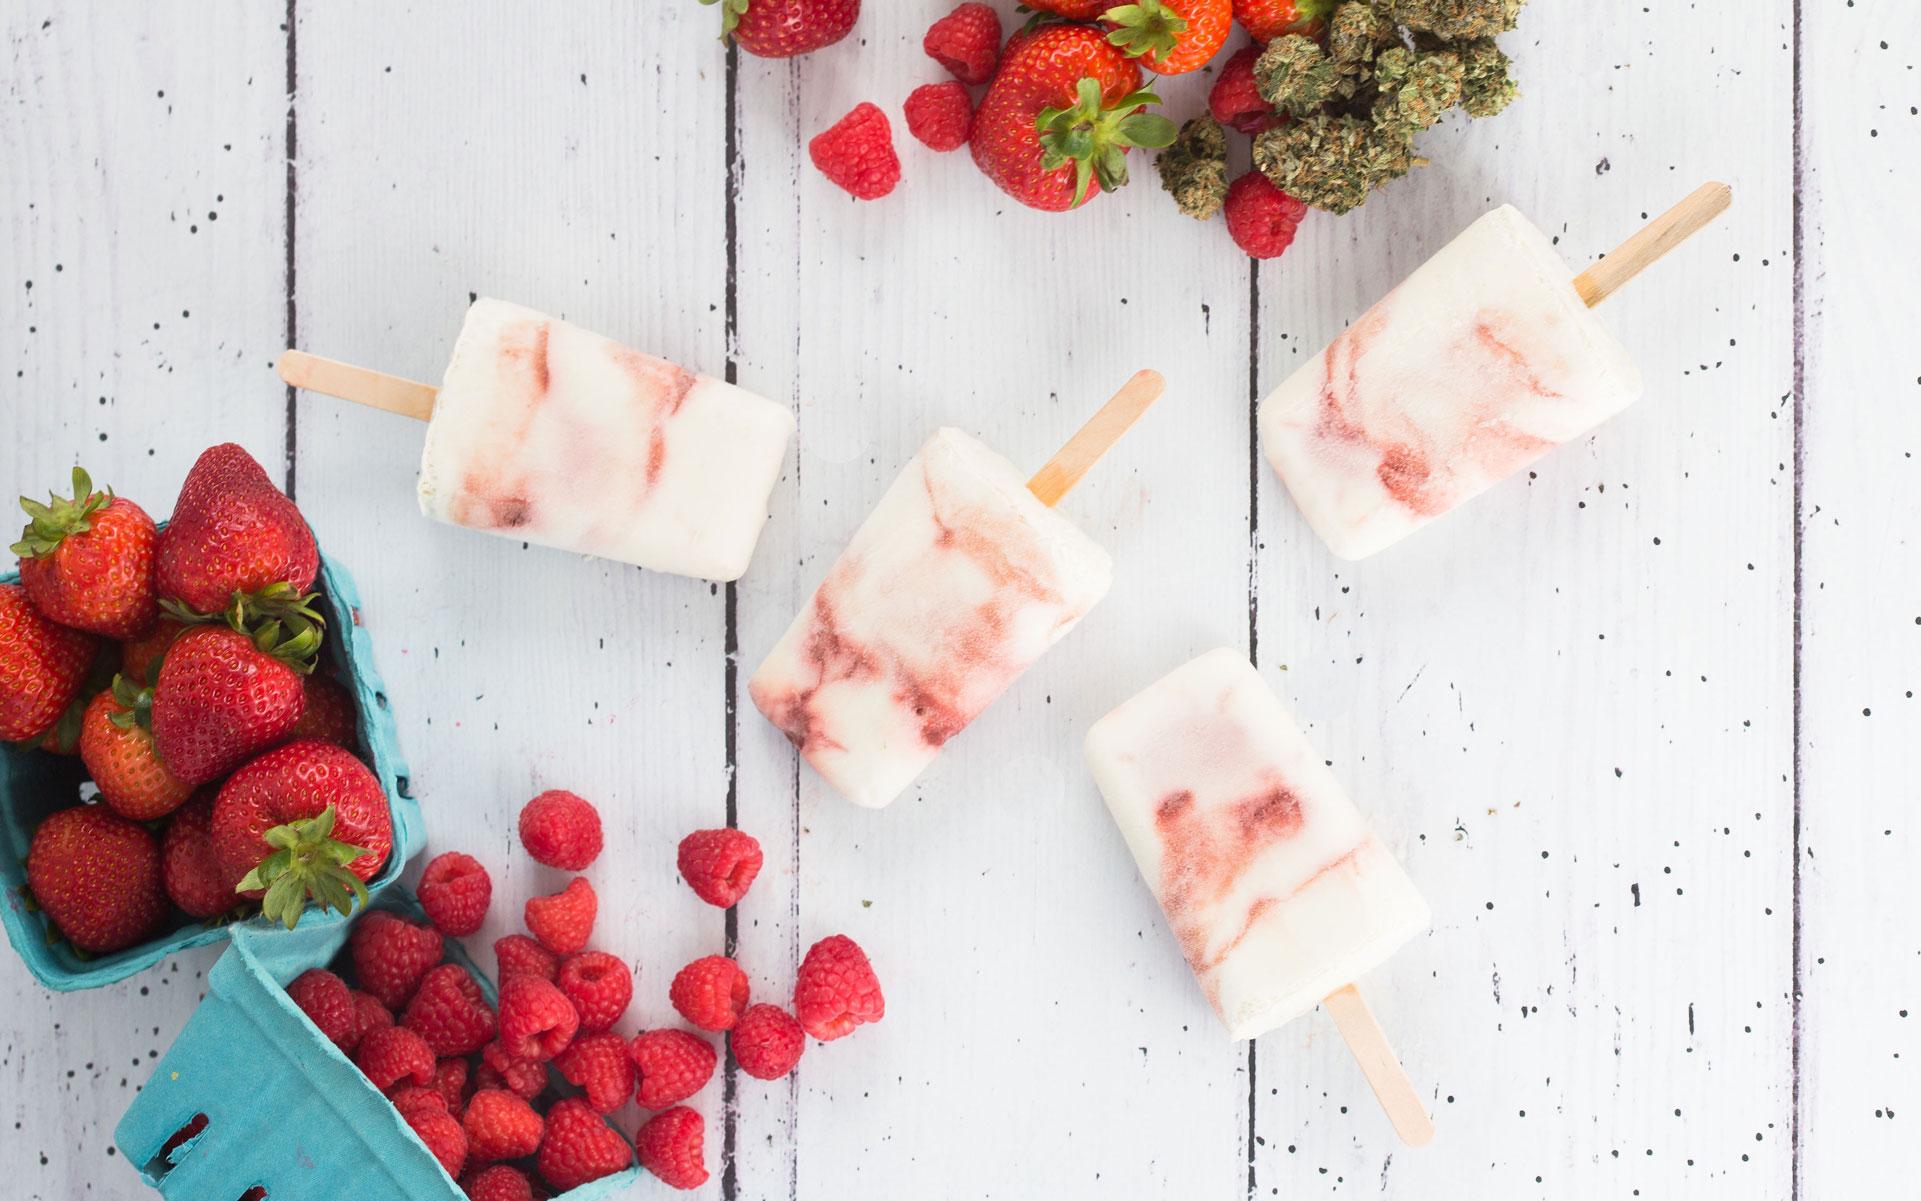 cannabis-infused yogurt pops